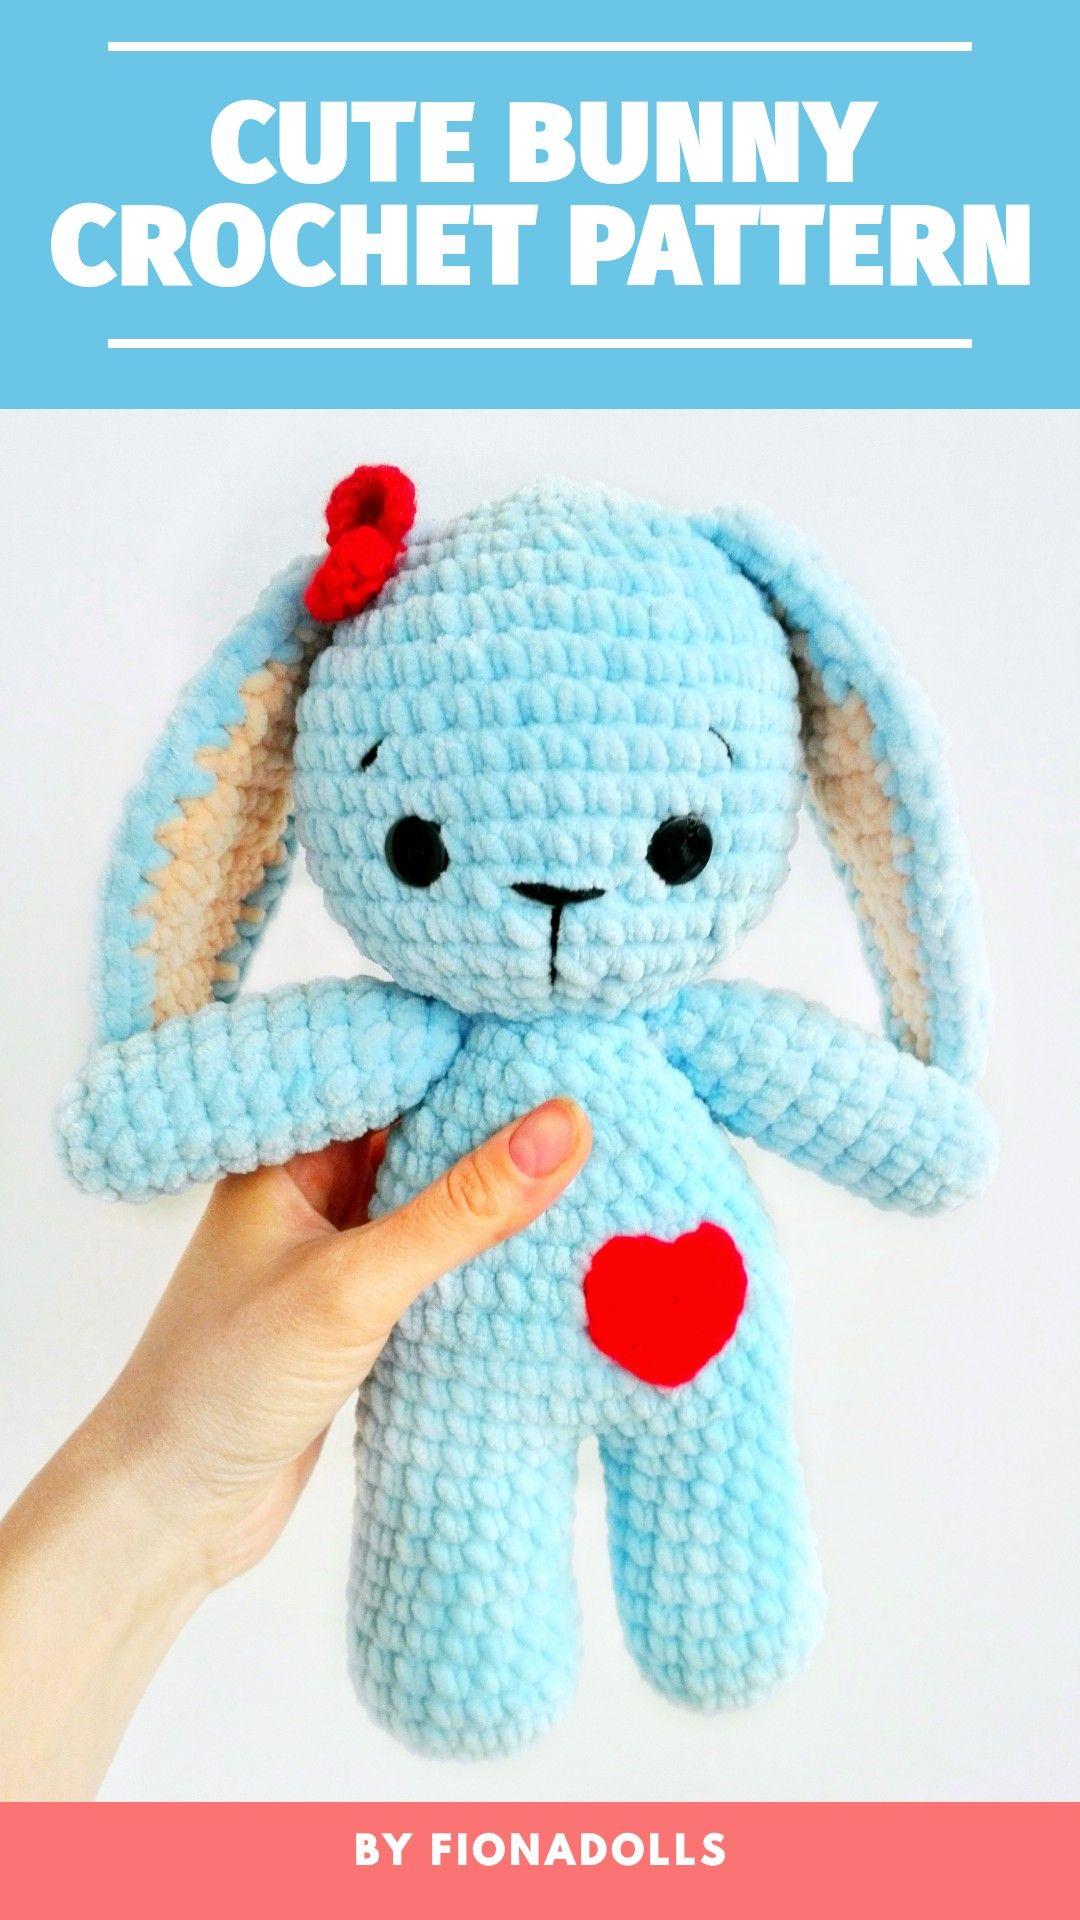 Amigurumi Cute Bunny Free Pattern | Crochet rabbit, Crochet bunny ... | 1920x1080